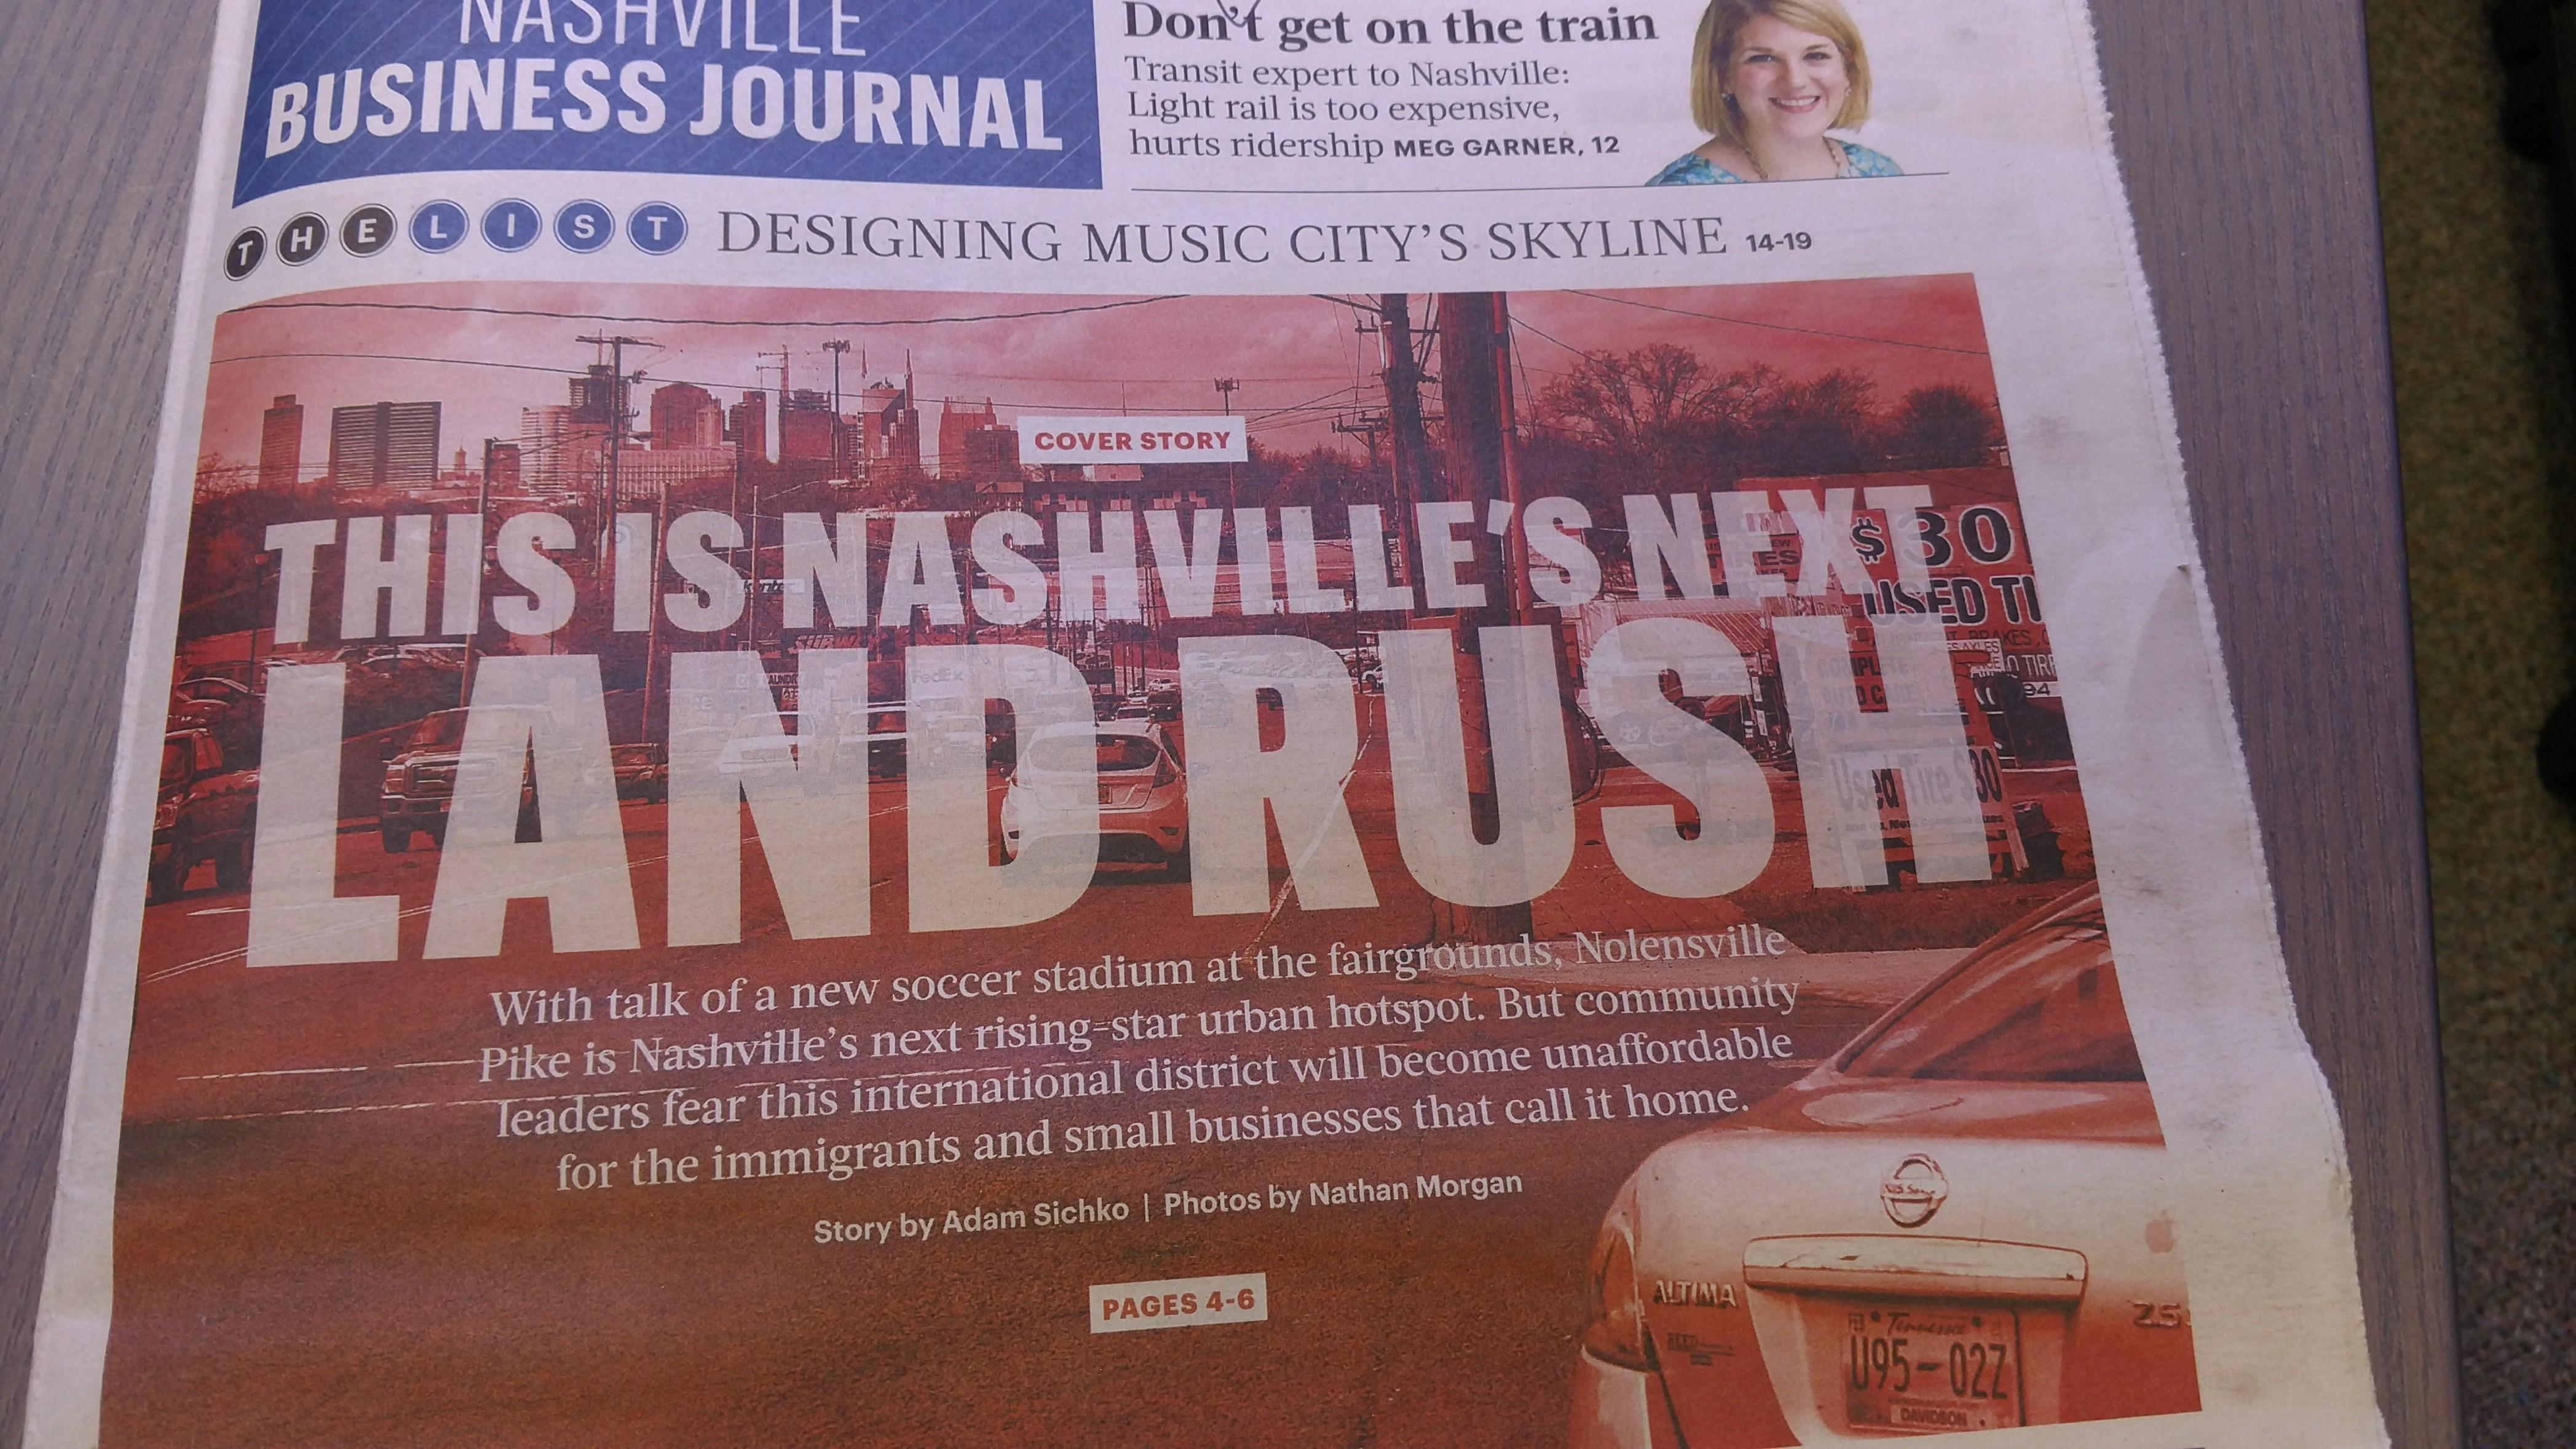 Nolensville Pike new Nashville urban hot spot